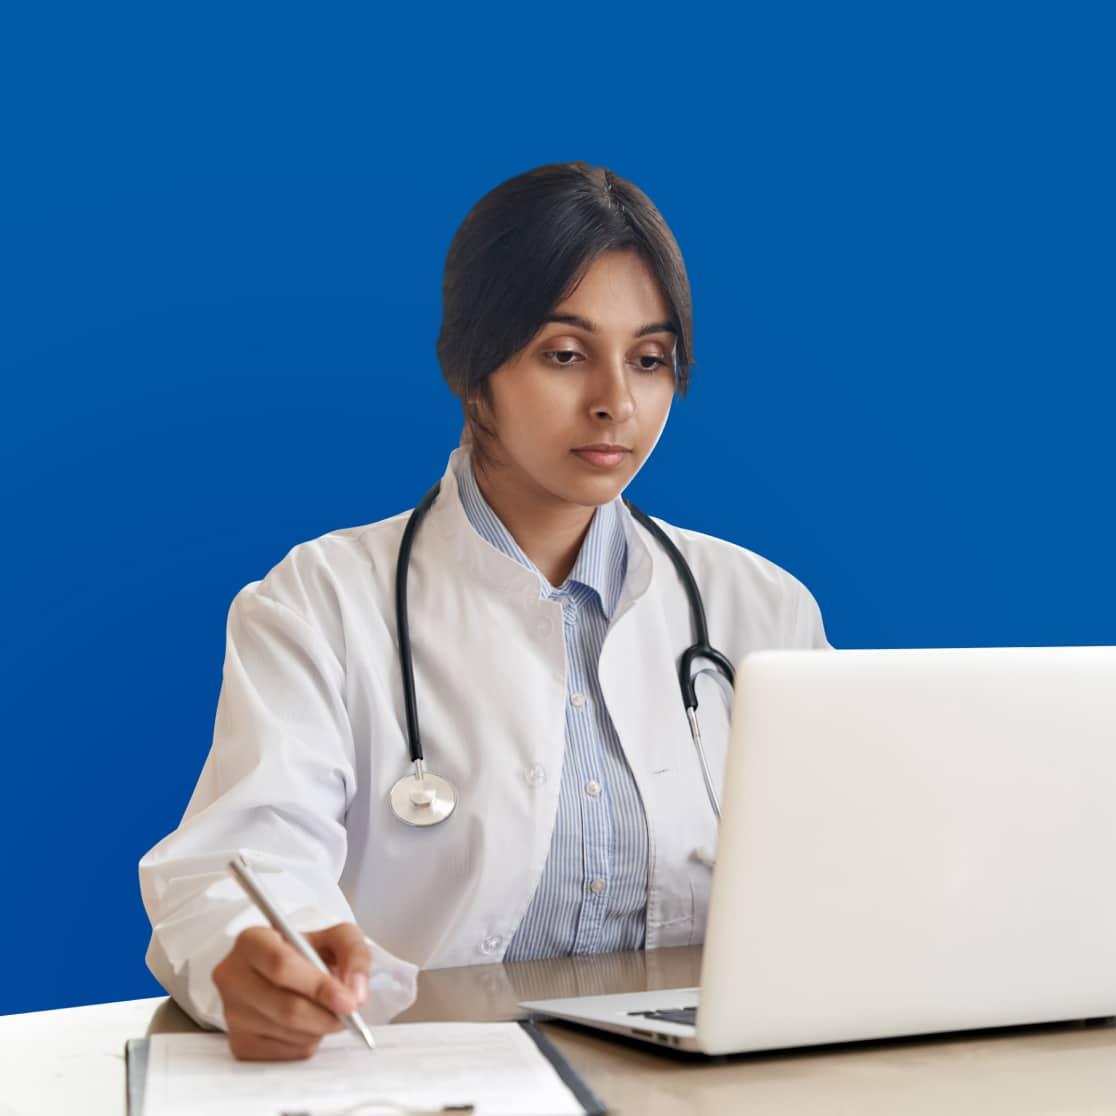 physicians_c.jpg